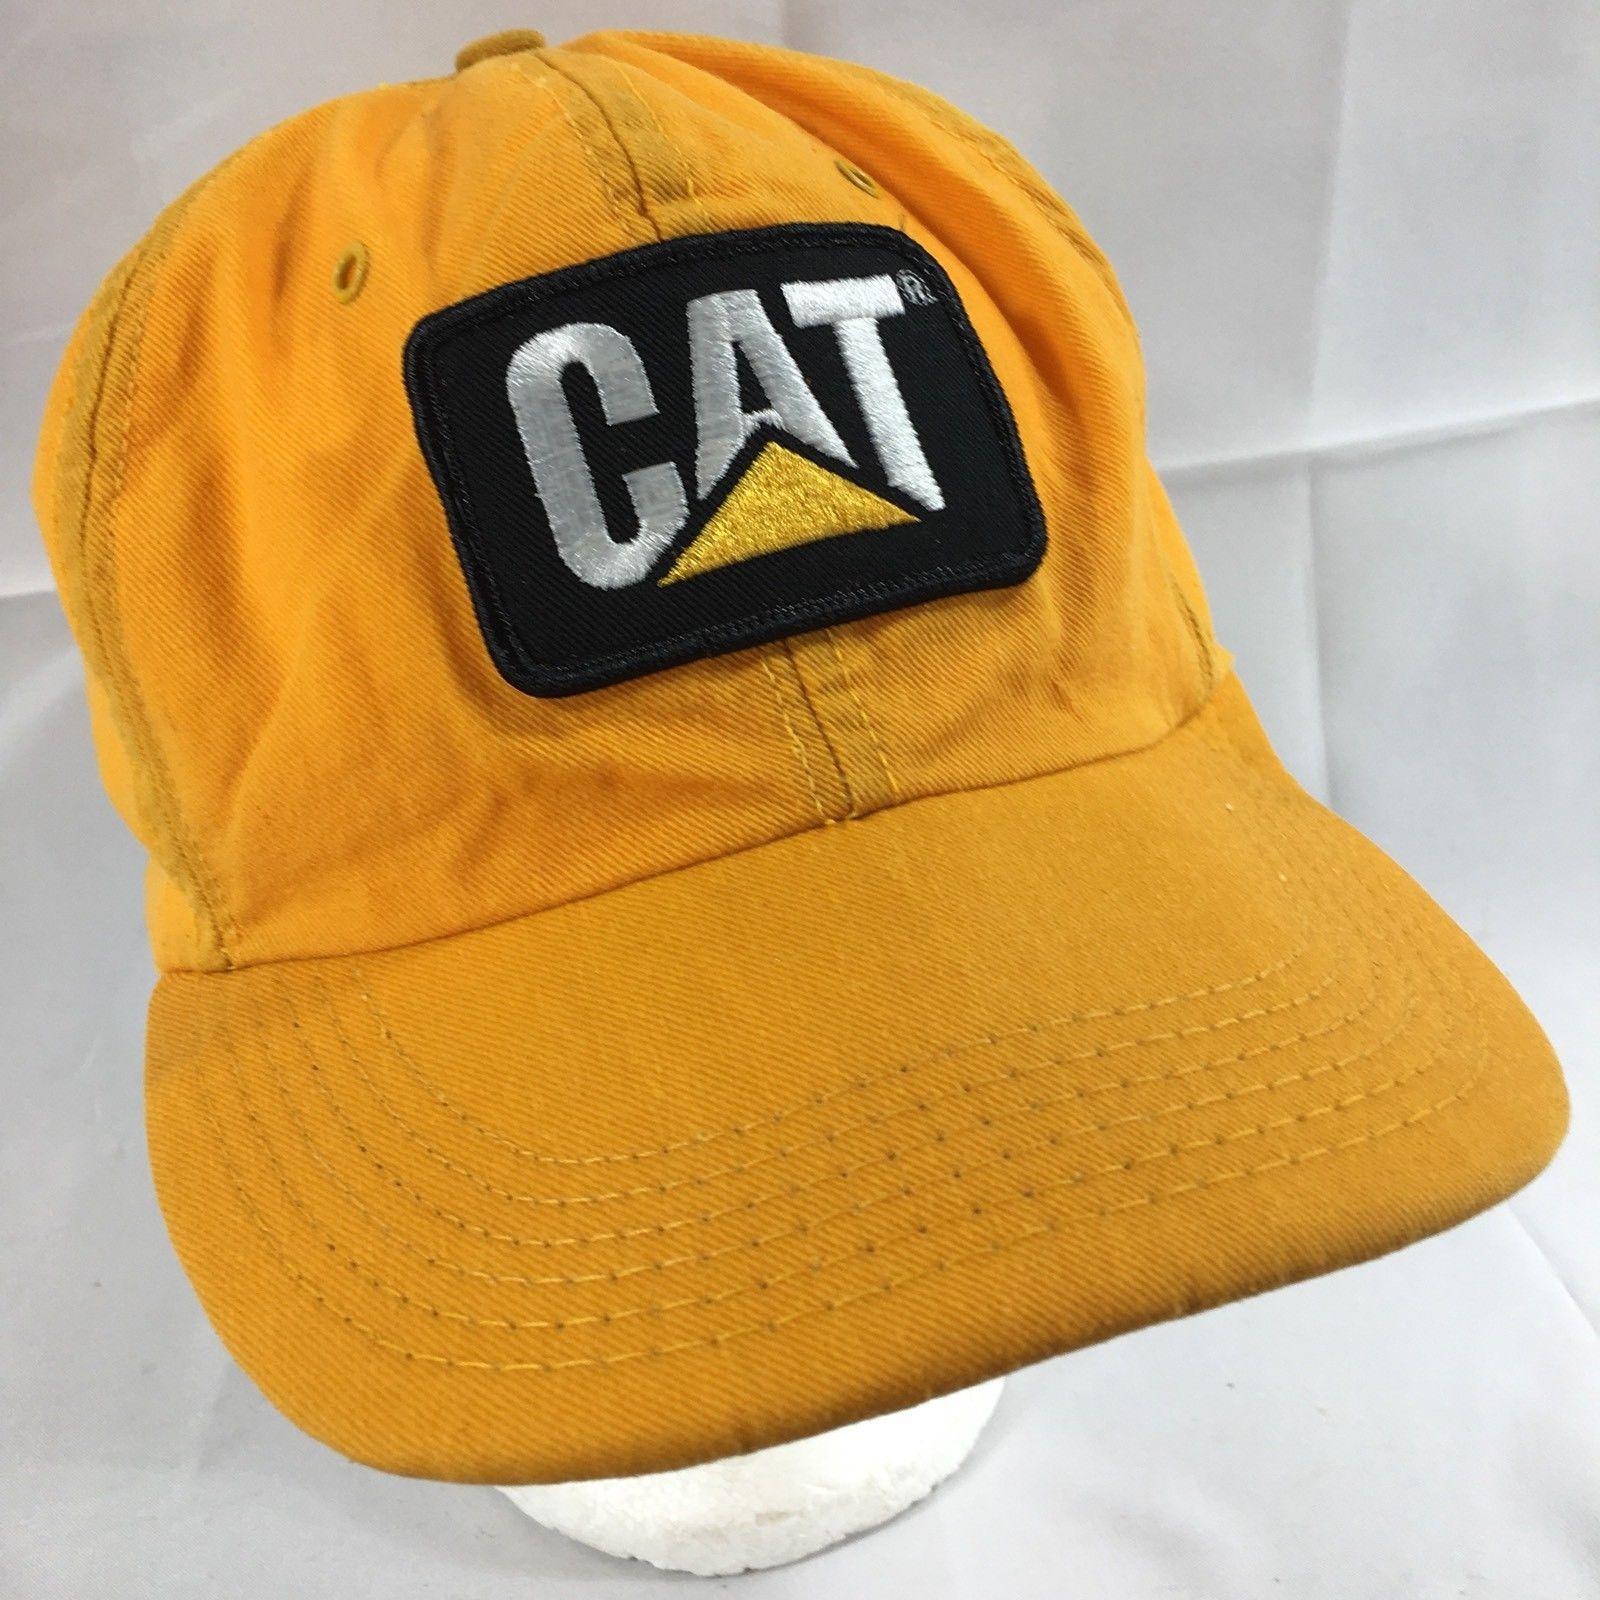 8d1295d6026e7 S l1600. S l1600. Previous. VTG CAT Caterpillar YELLOW Flat Bill Trucker Hat  Urban Snapback Cap with Patch